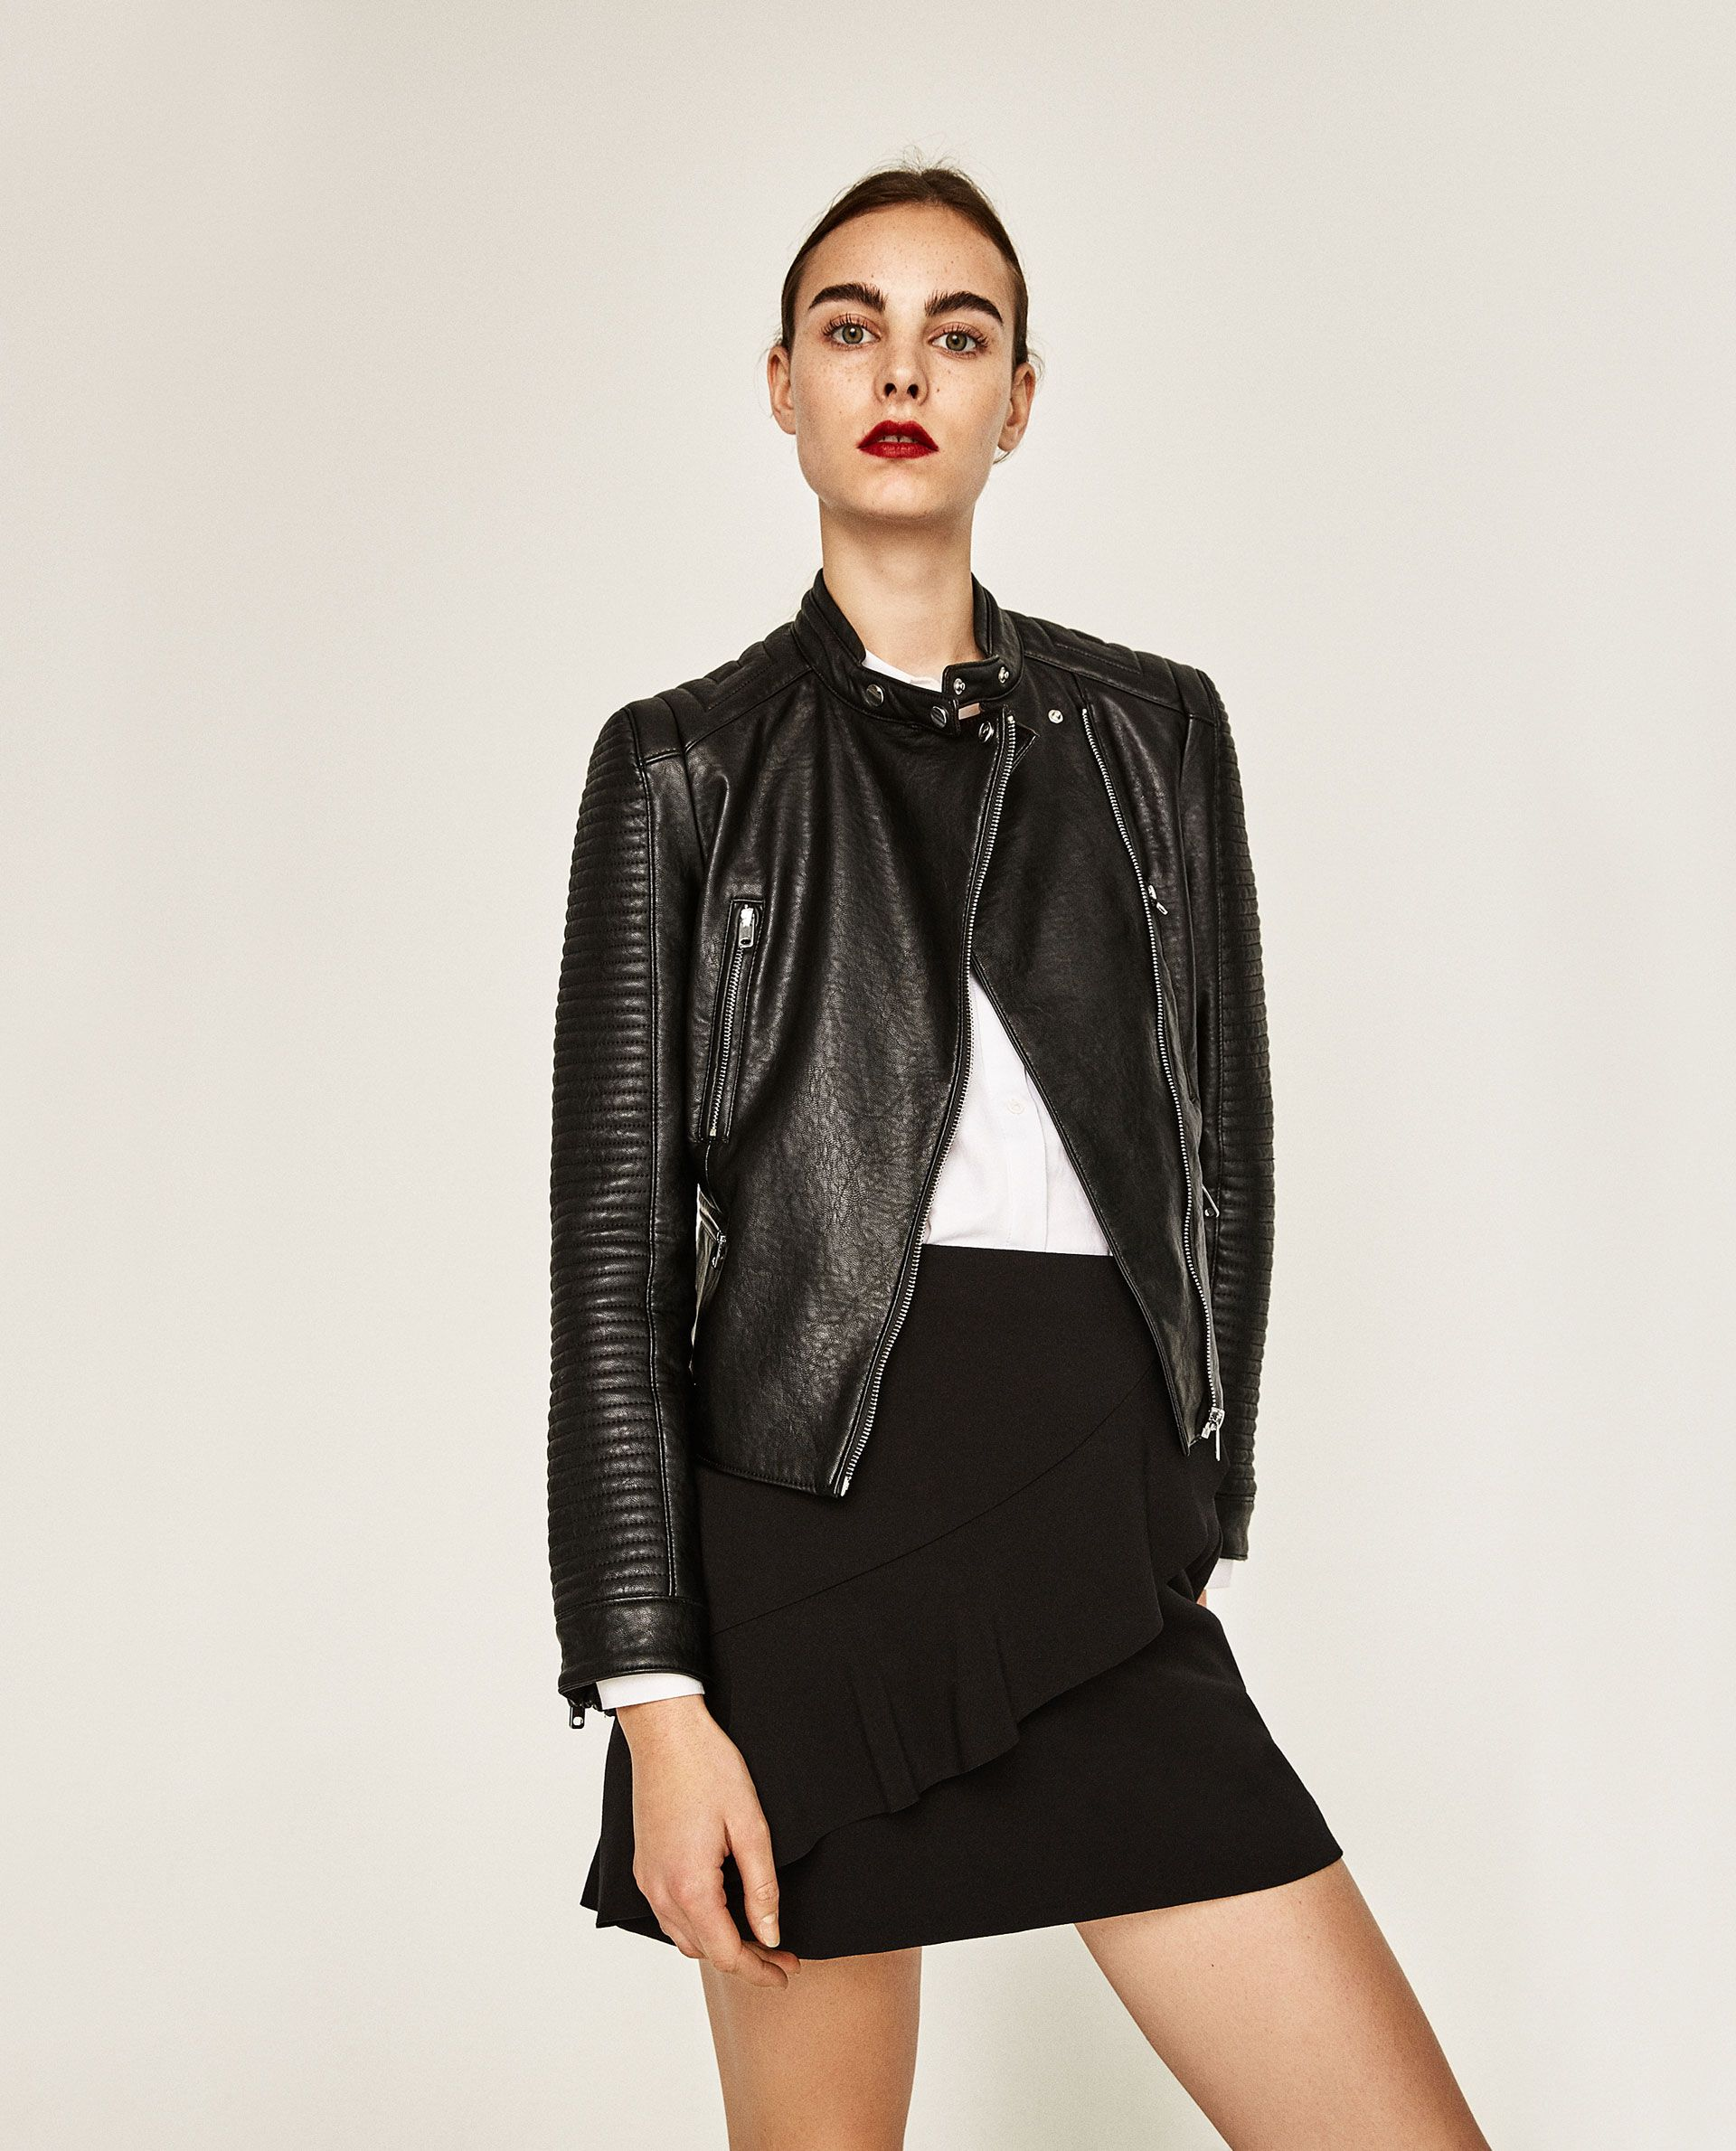 Leather Jacket from Zara Jackets, Jackets for women